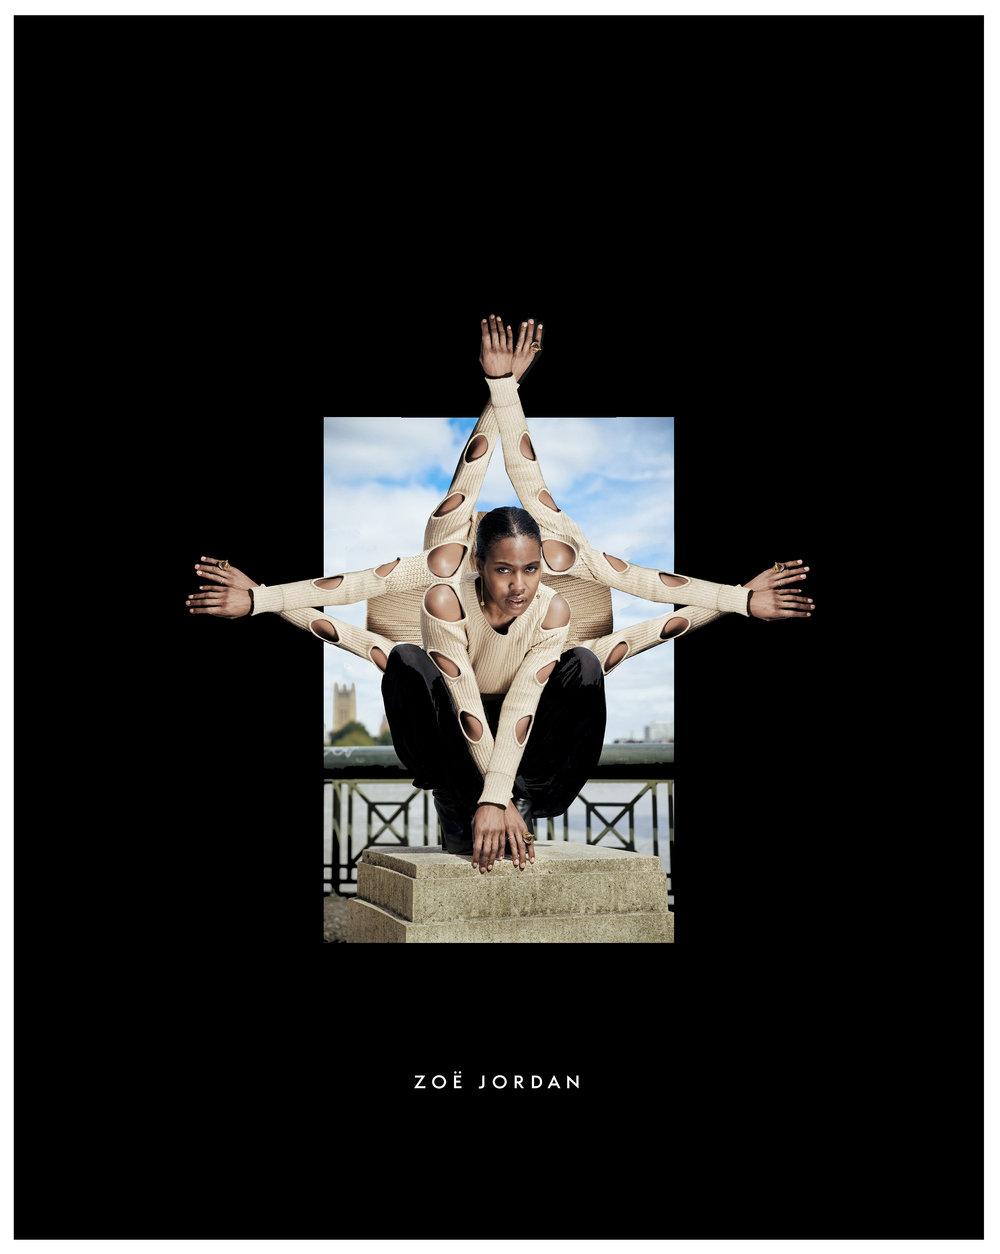 SUSAN BENDER WEARING ZOE JORDAN - PHOTO BY CHUCK NOBLE - COLLAGE AND CREATIVE DIRECTION JONATHAN FERRARI / SUSAN BENDER